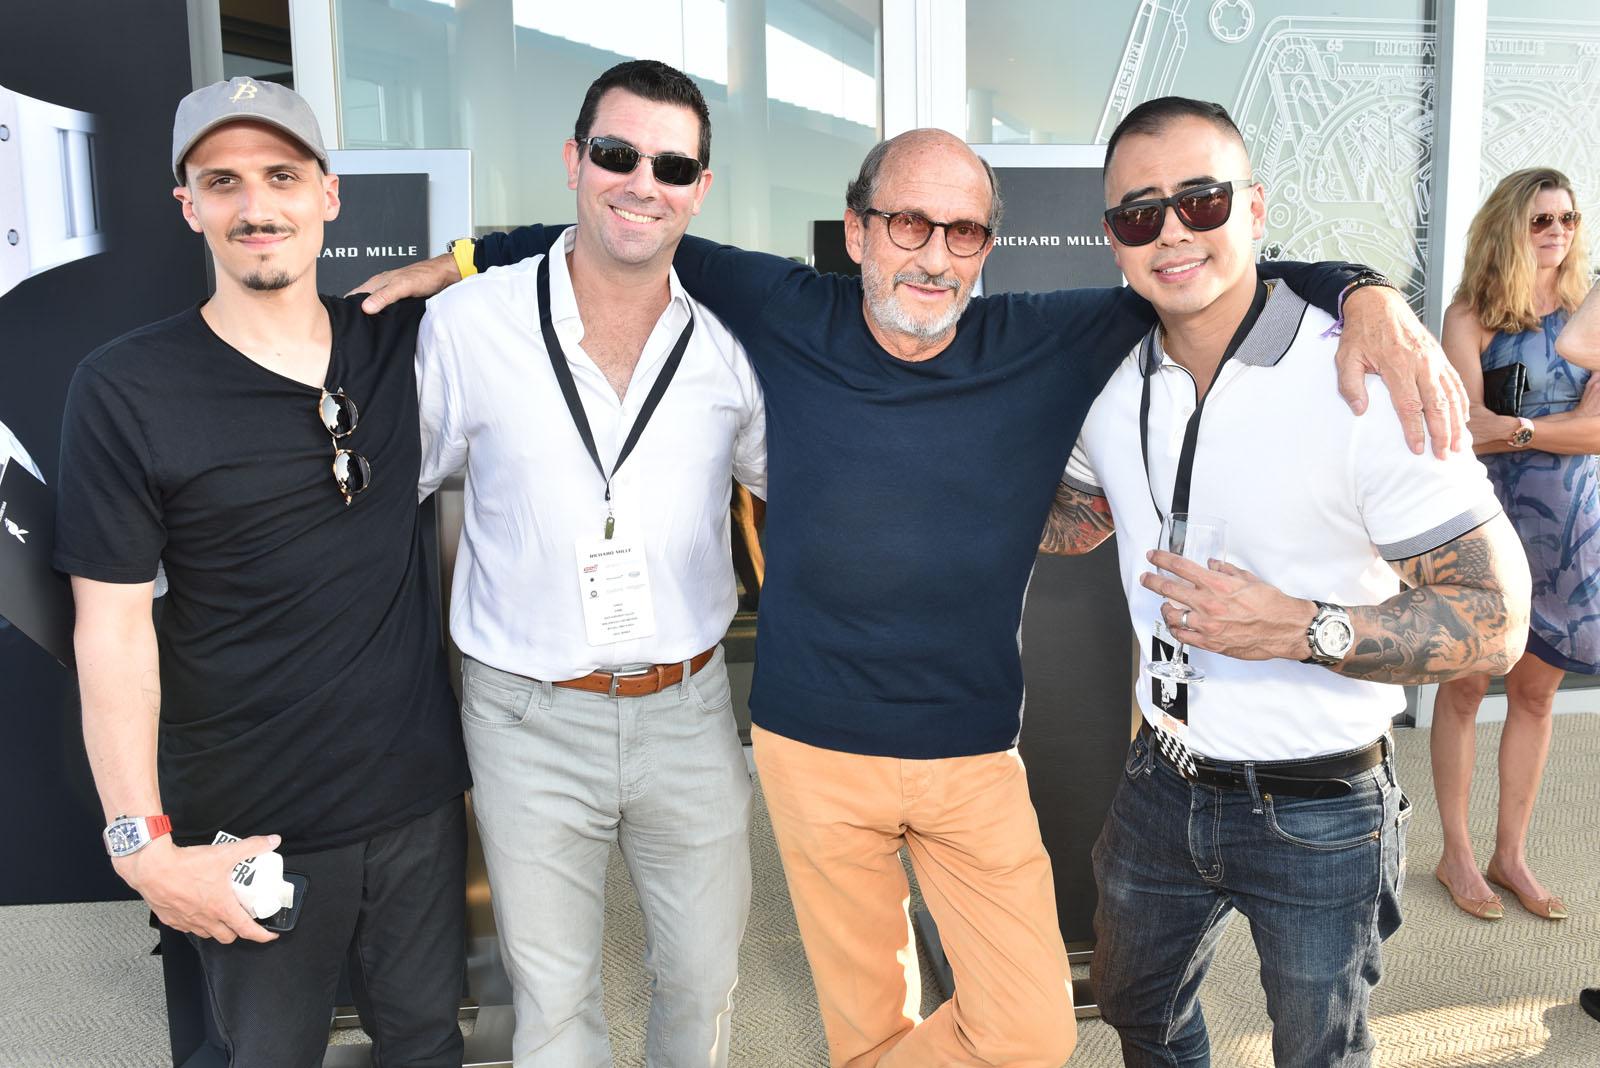 Alex Mille, Ron Alalouf, Richard Mille, Joe Park / The Bridge 2017 / Former Bridgehampton Race Circuit, Bridgehampton, NY / September 16, 2017 / ©Patrick McMullan / Photo - Jared Siskin / PMC